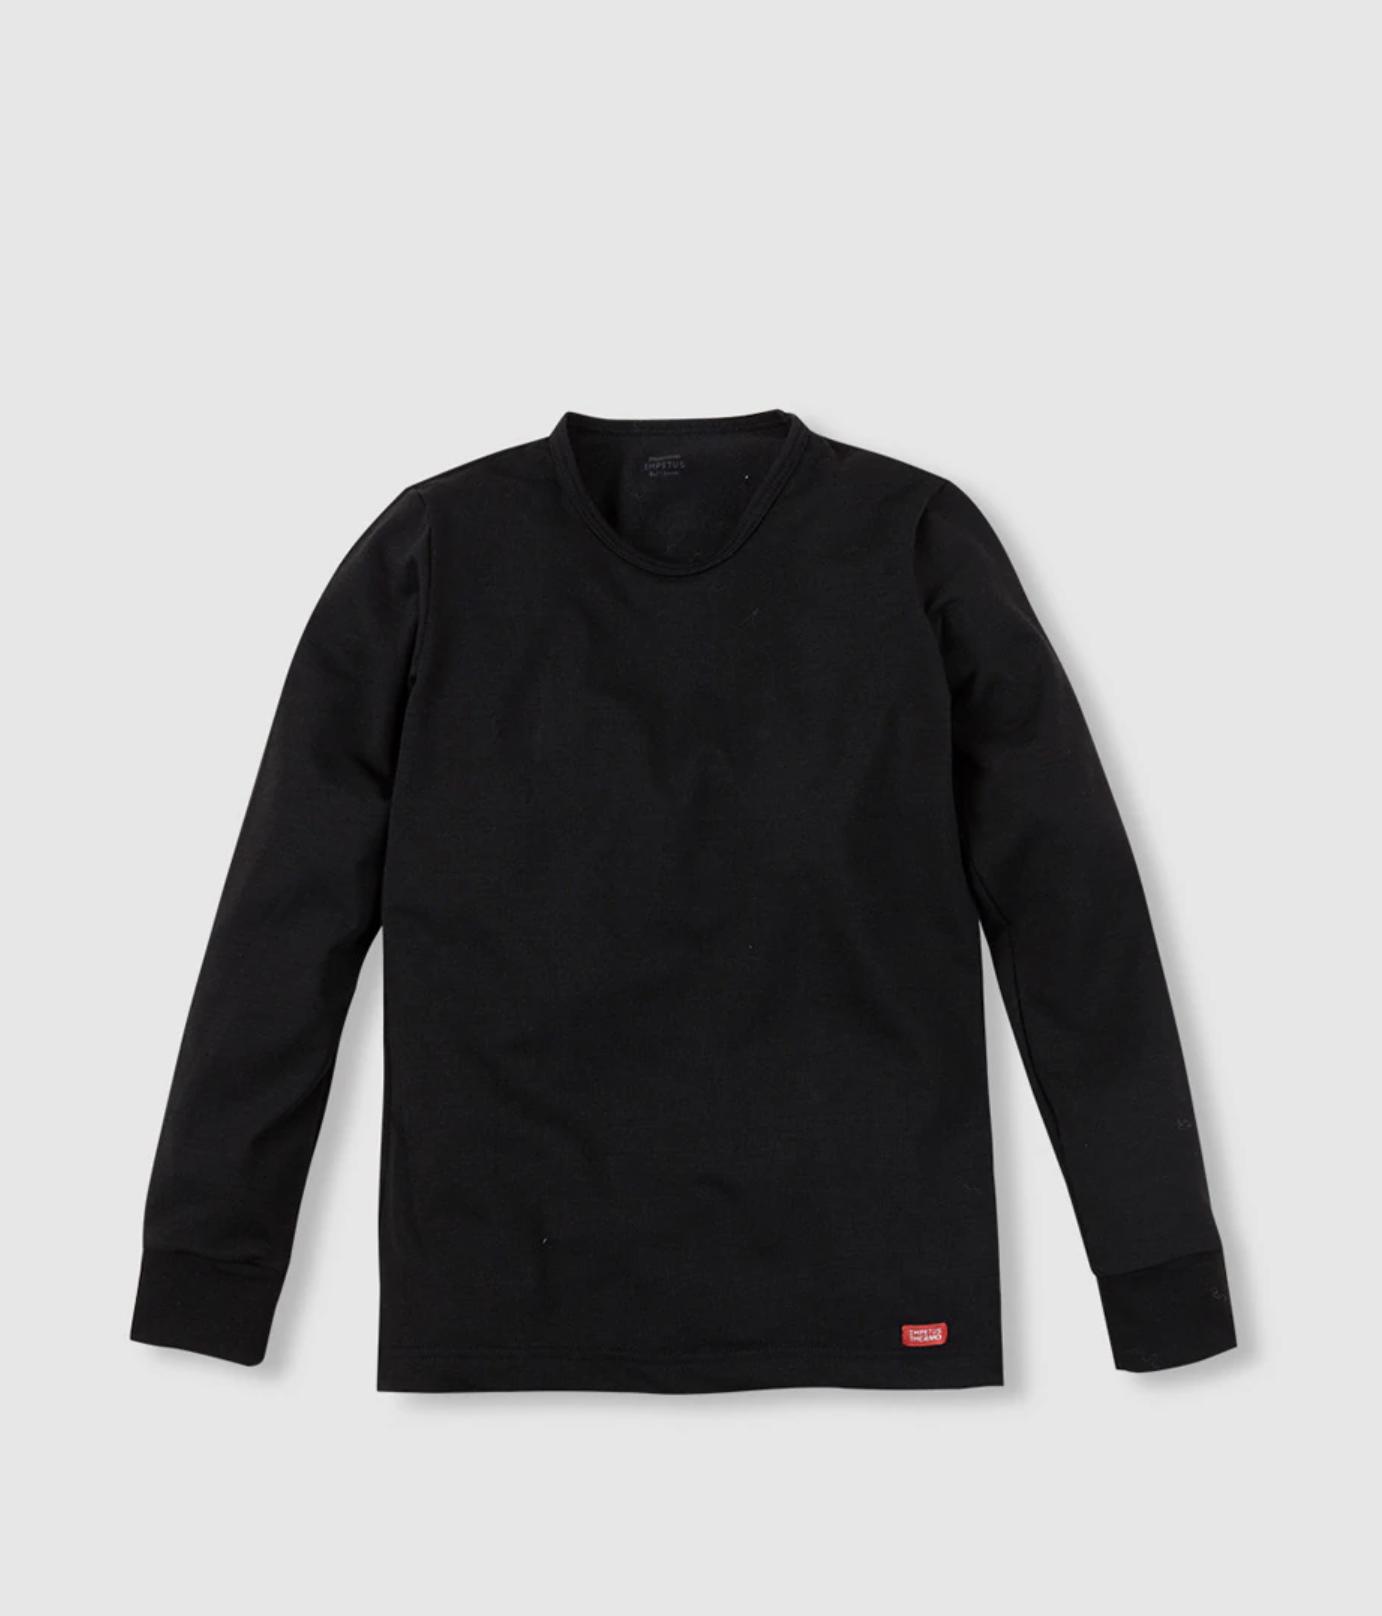 Camiseta infantil Impetus en negro térmica